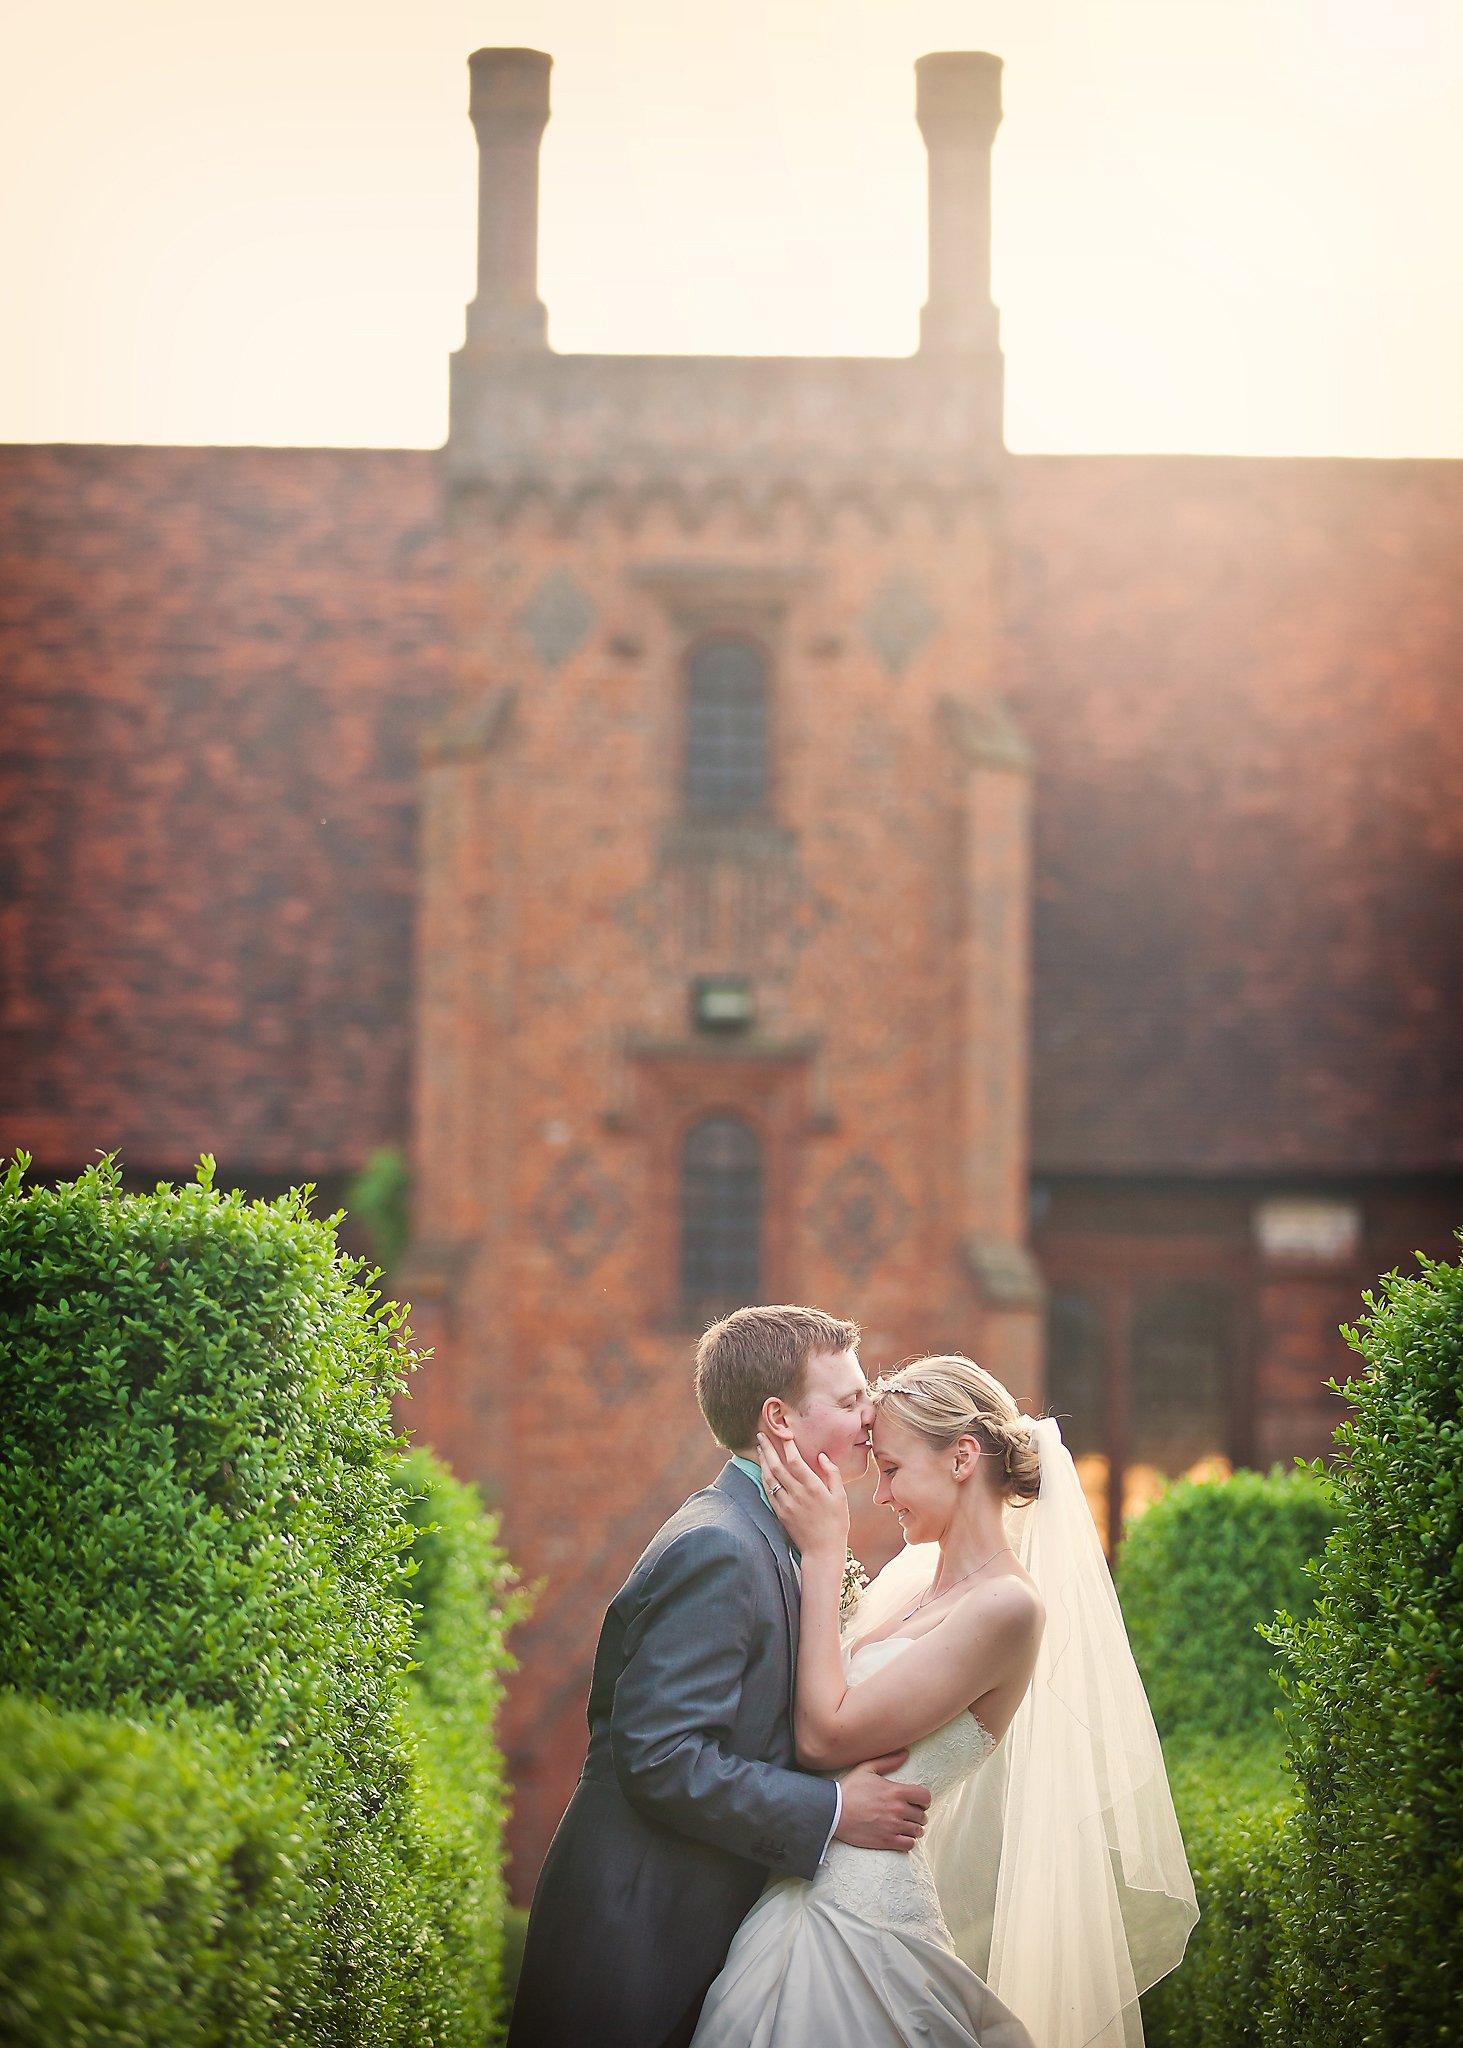 wedding couple kissing hatfield house wedding photography esme robinson